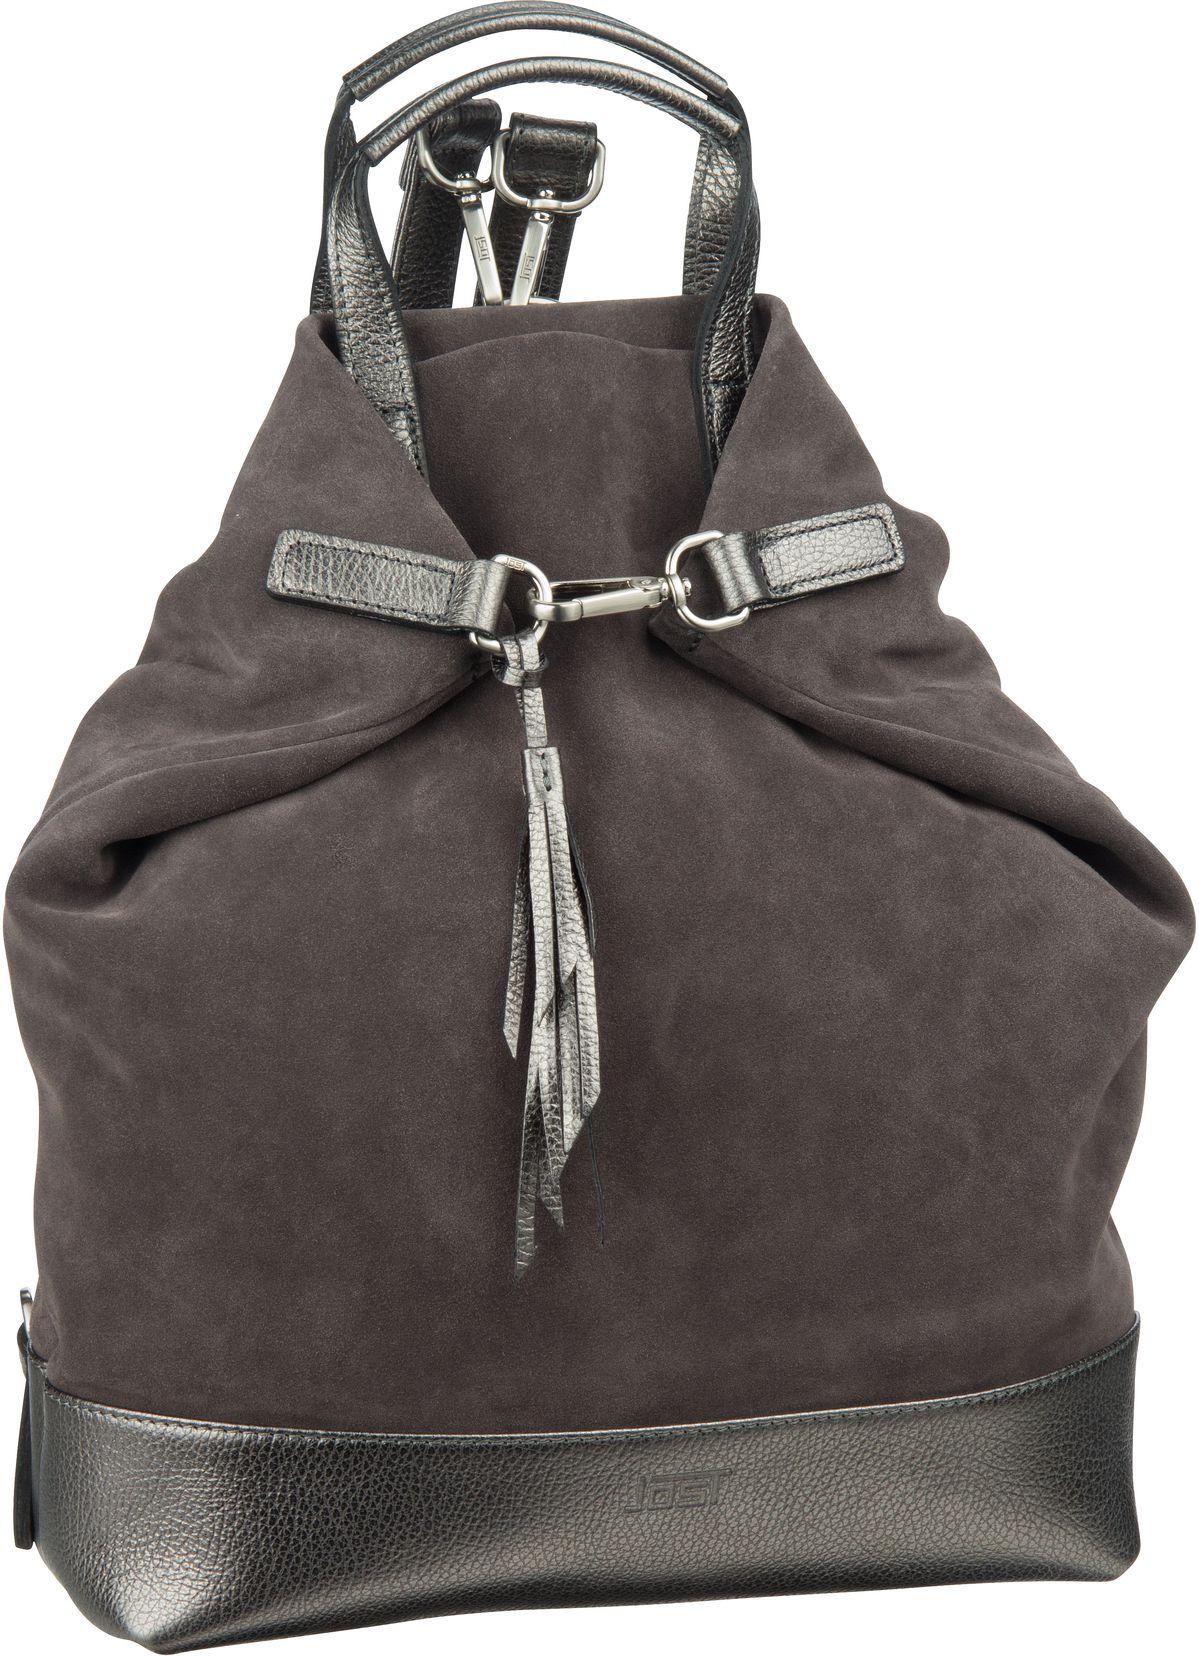 Rucksack / Daypack Motala 1730 X-Change 3in1 Bag S Silver